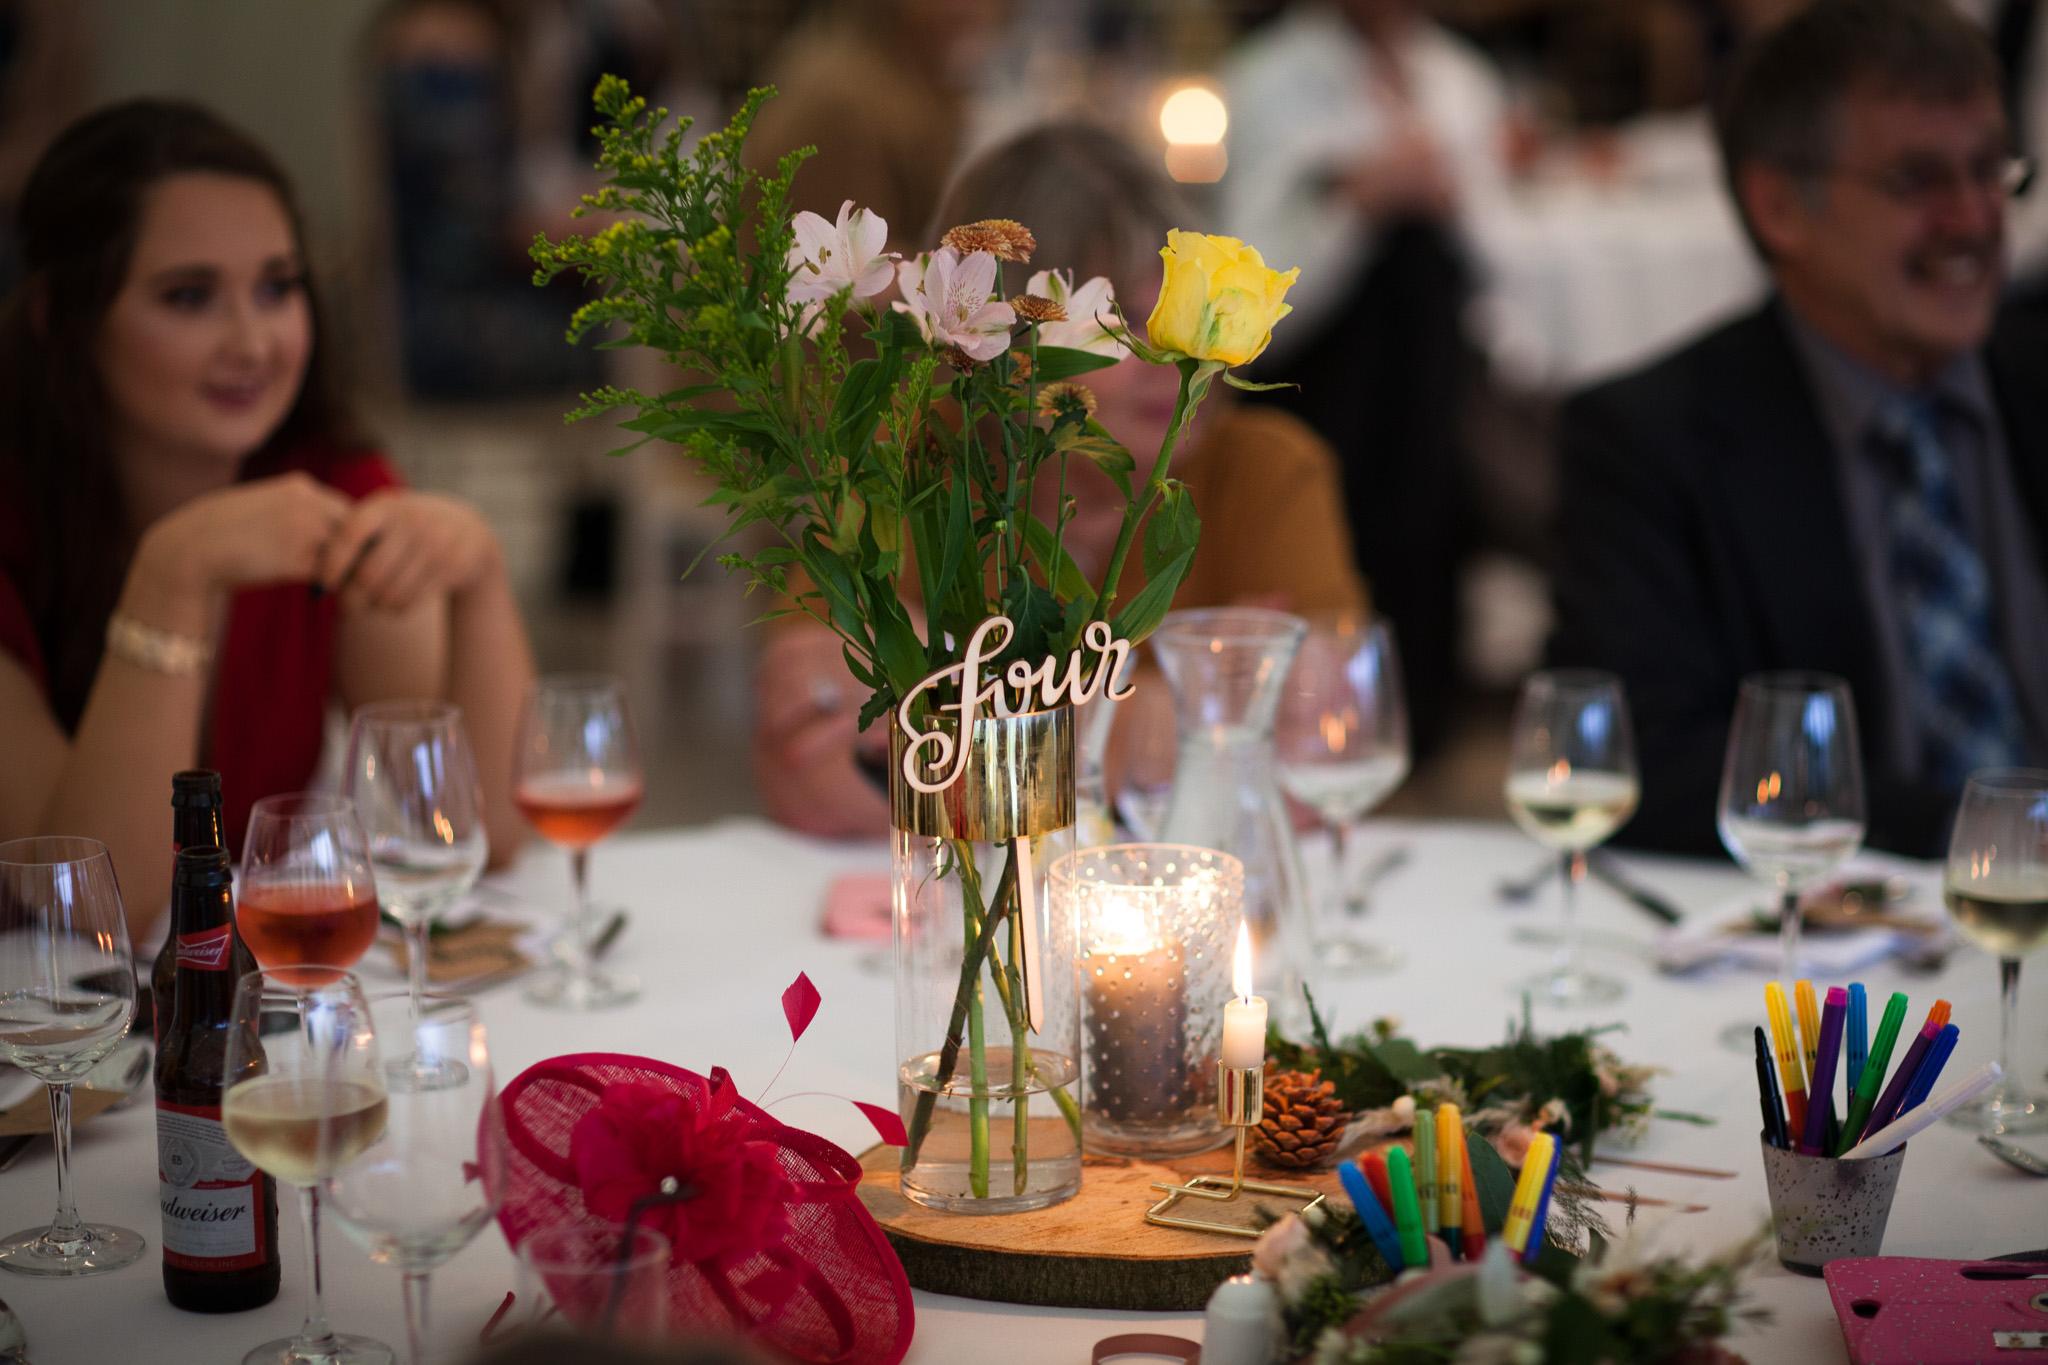 Mark_Barnes_Northern_Ireland_Wedding_Photography_Ballyscullion_Park_Wedding_Photography_Stef&Bobby-56.jpg